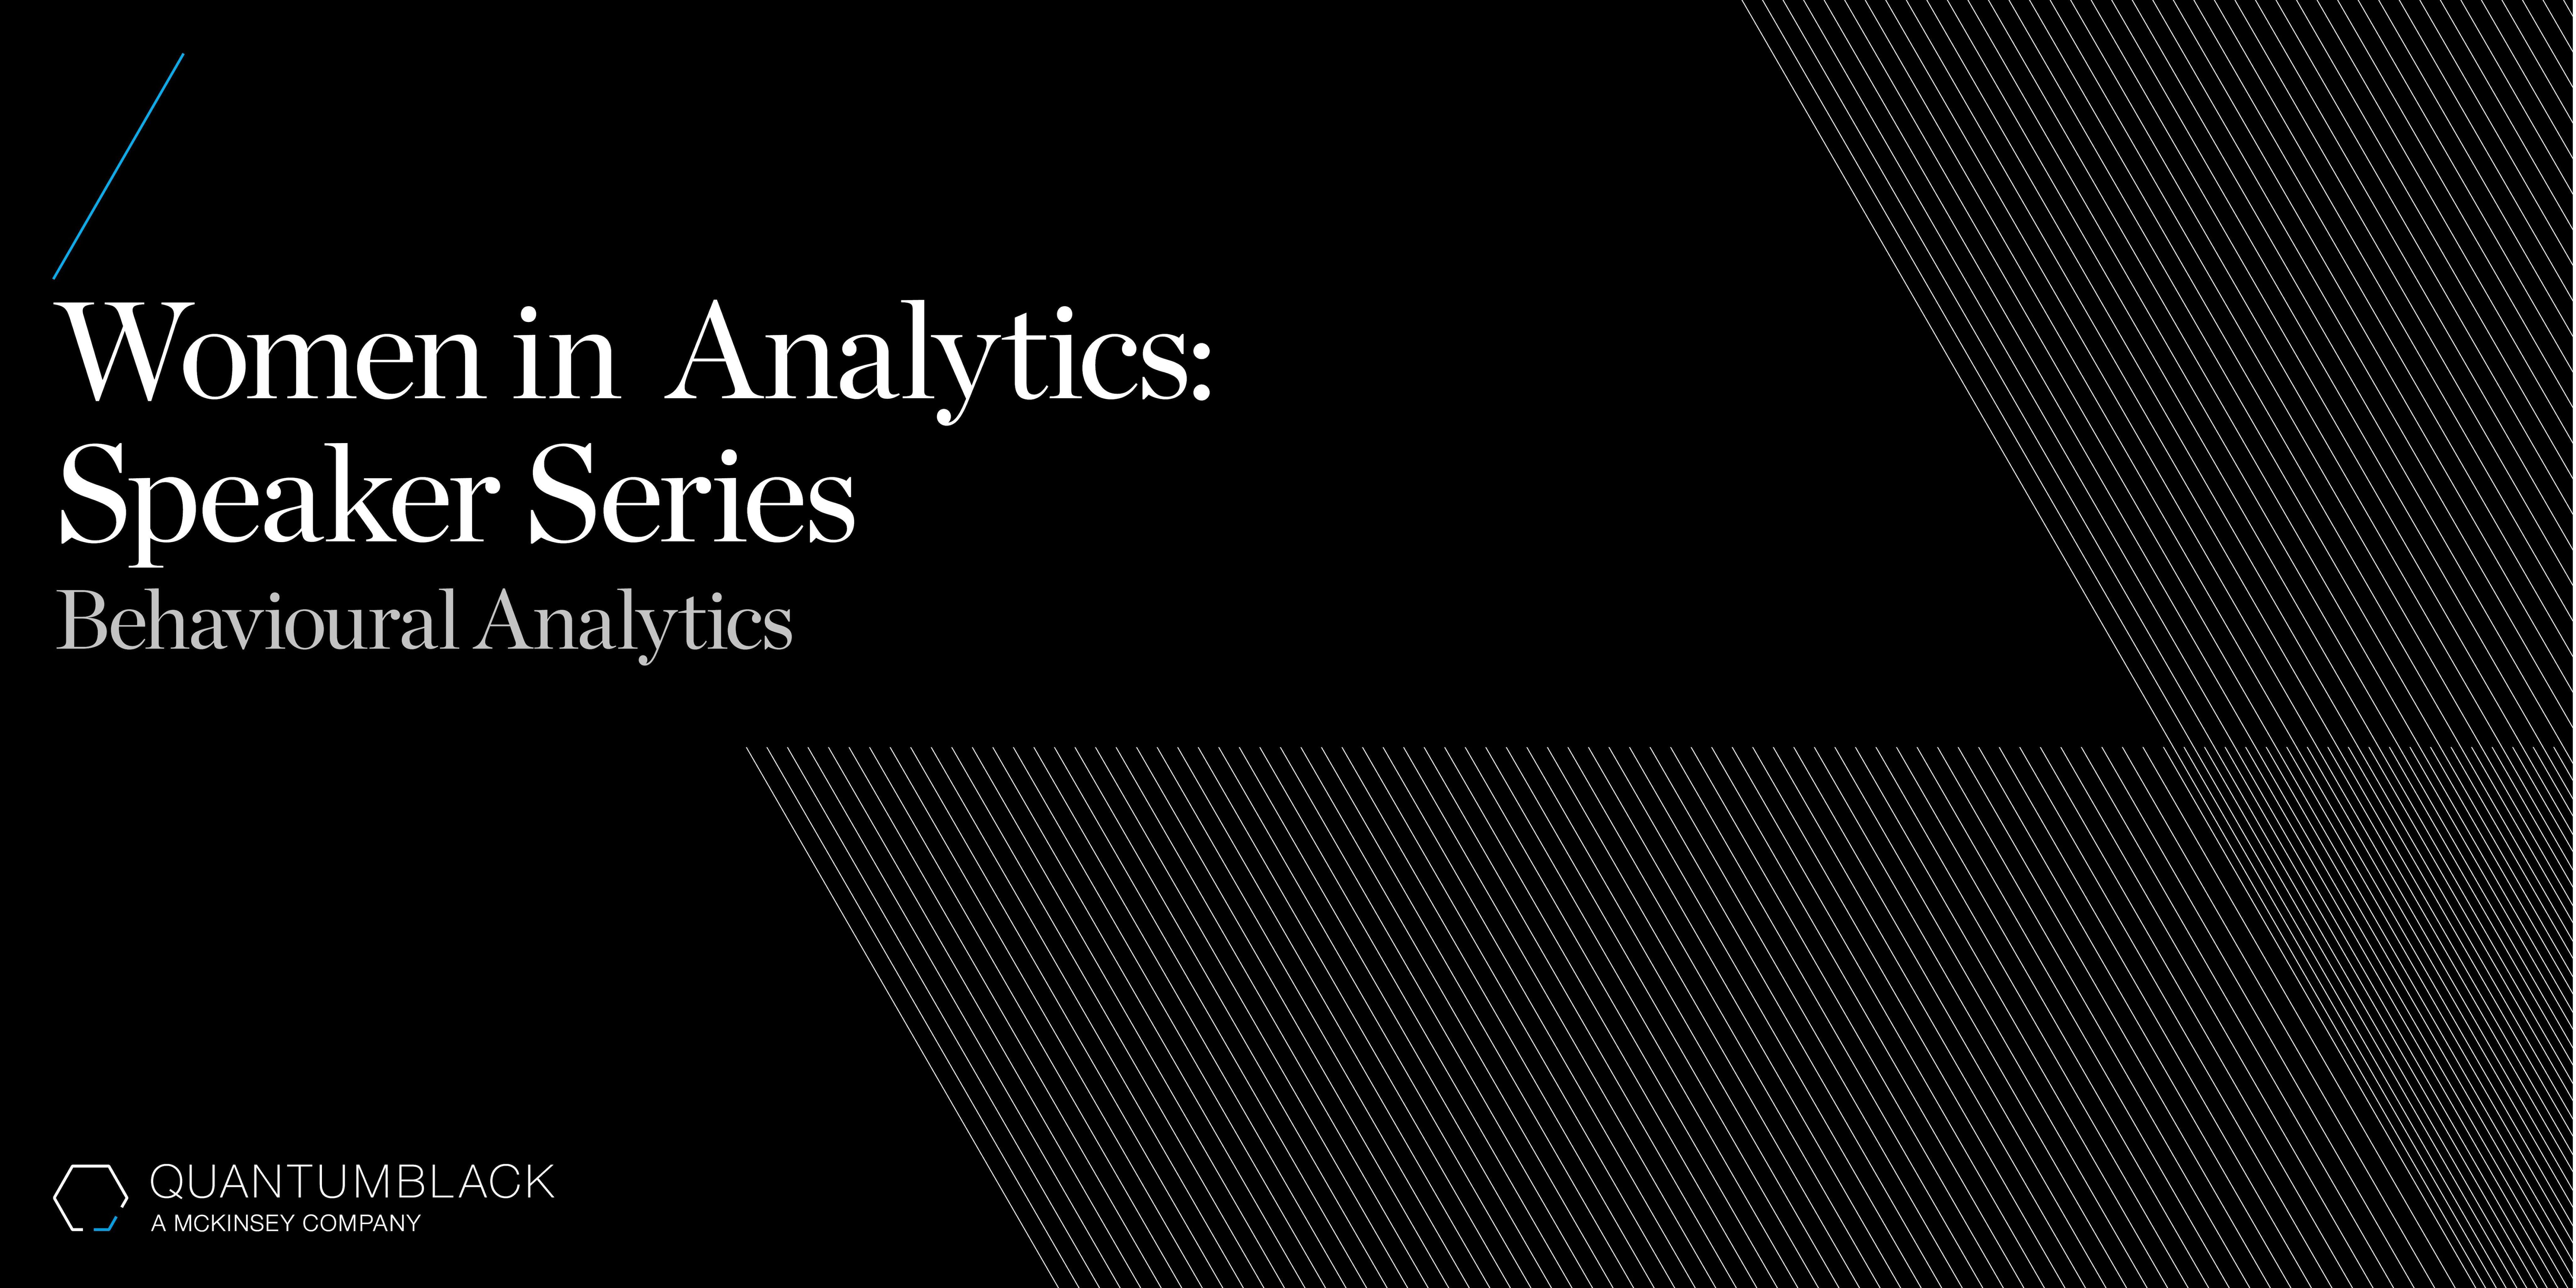 QuantumBlack Women in Analytics Speaker Series at McKinsey